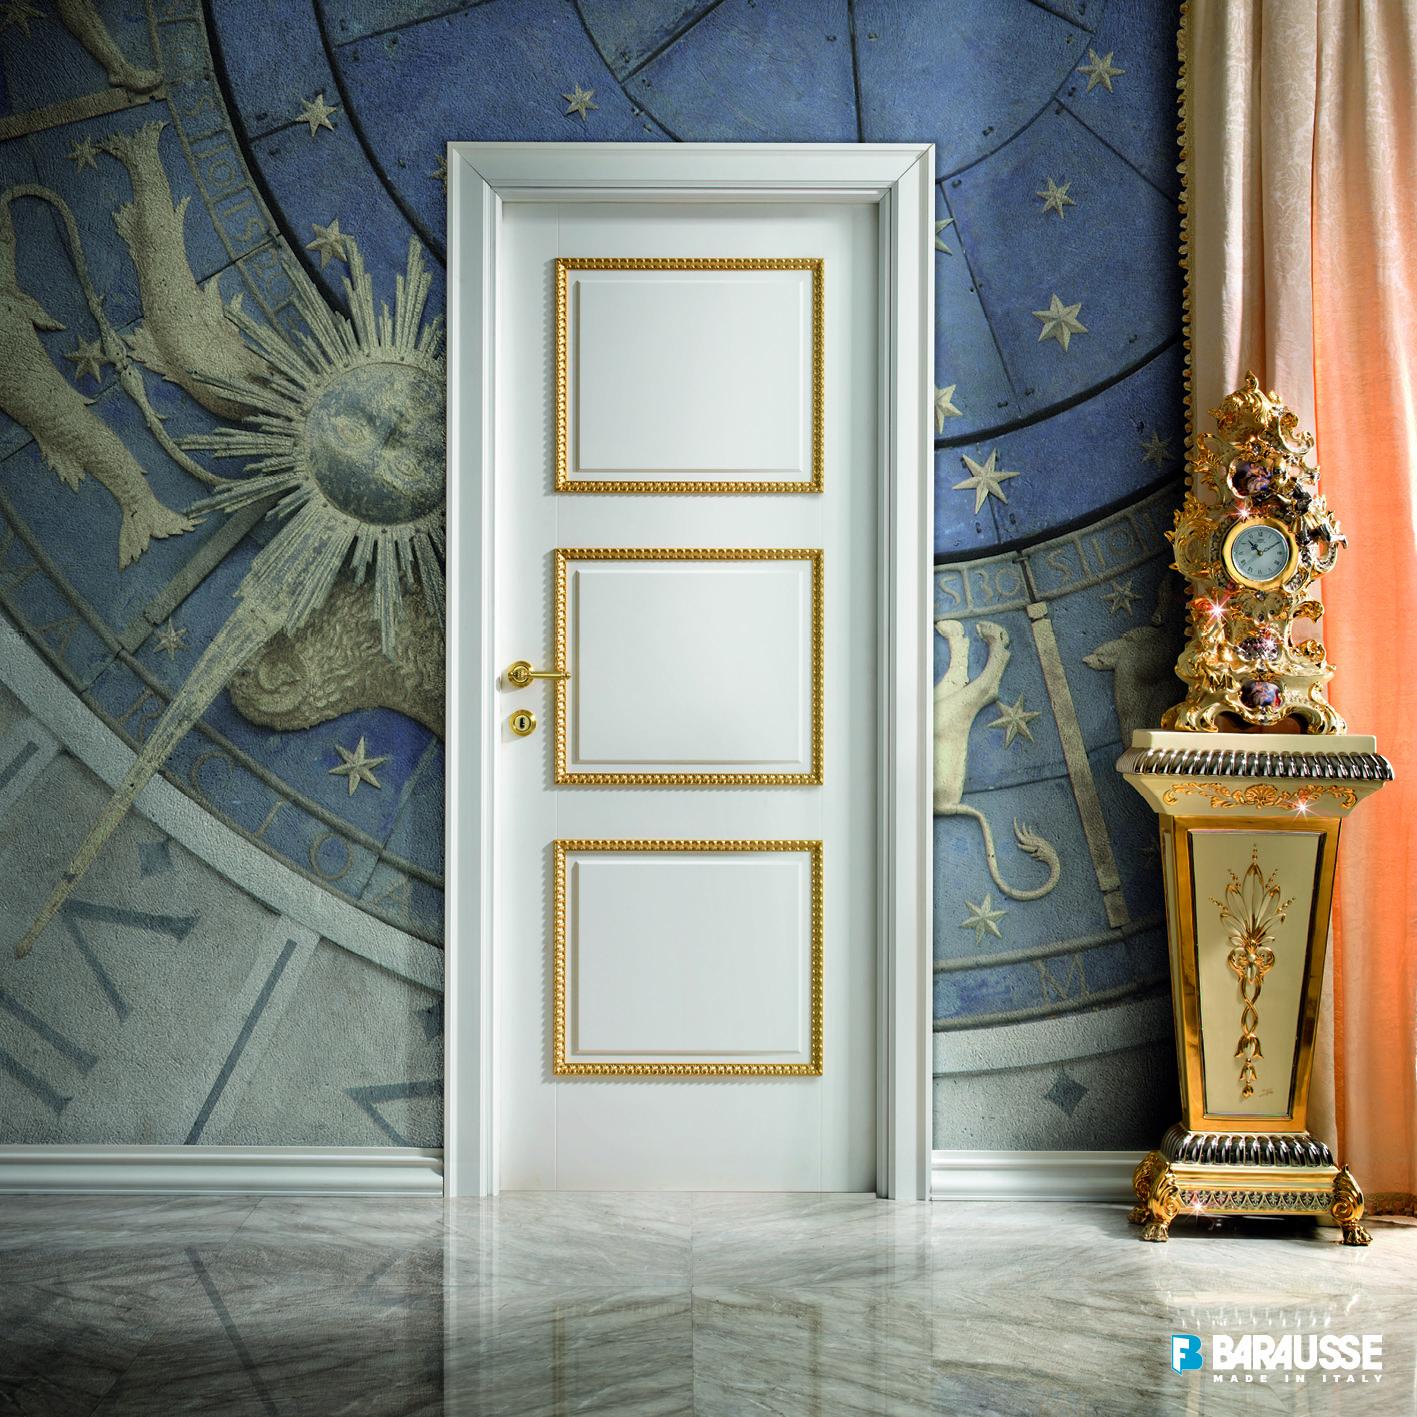 Exclusive Home Interiors-21